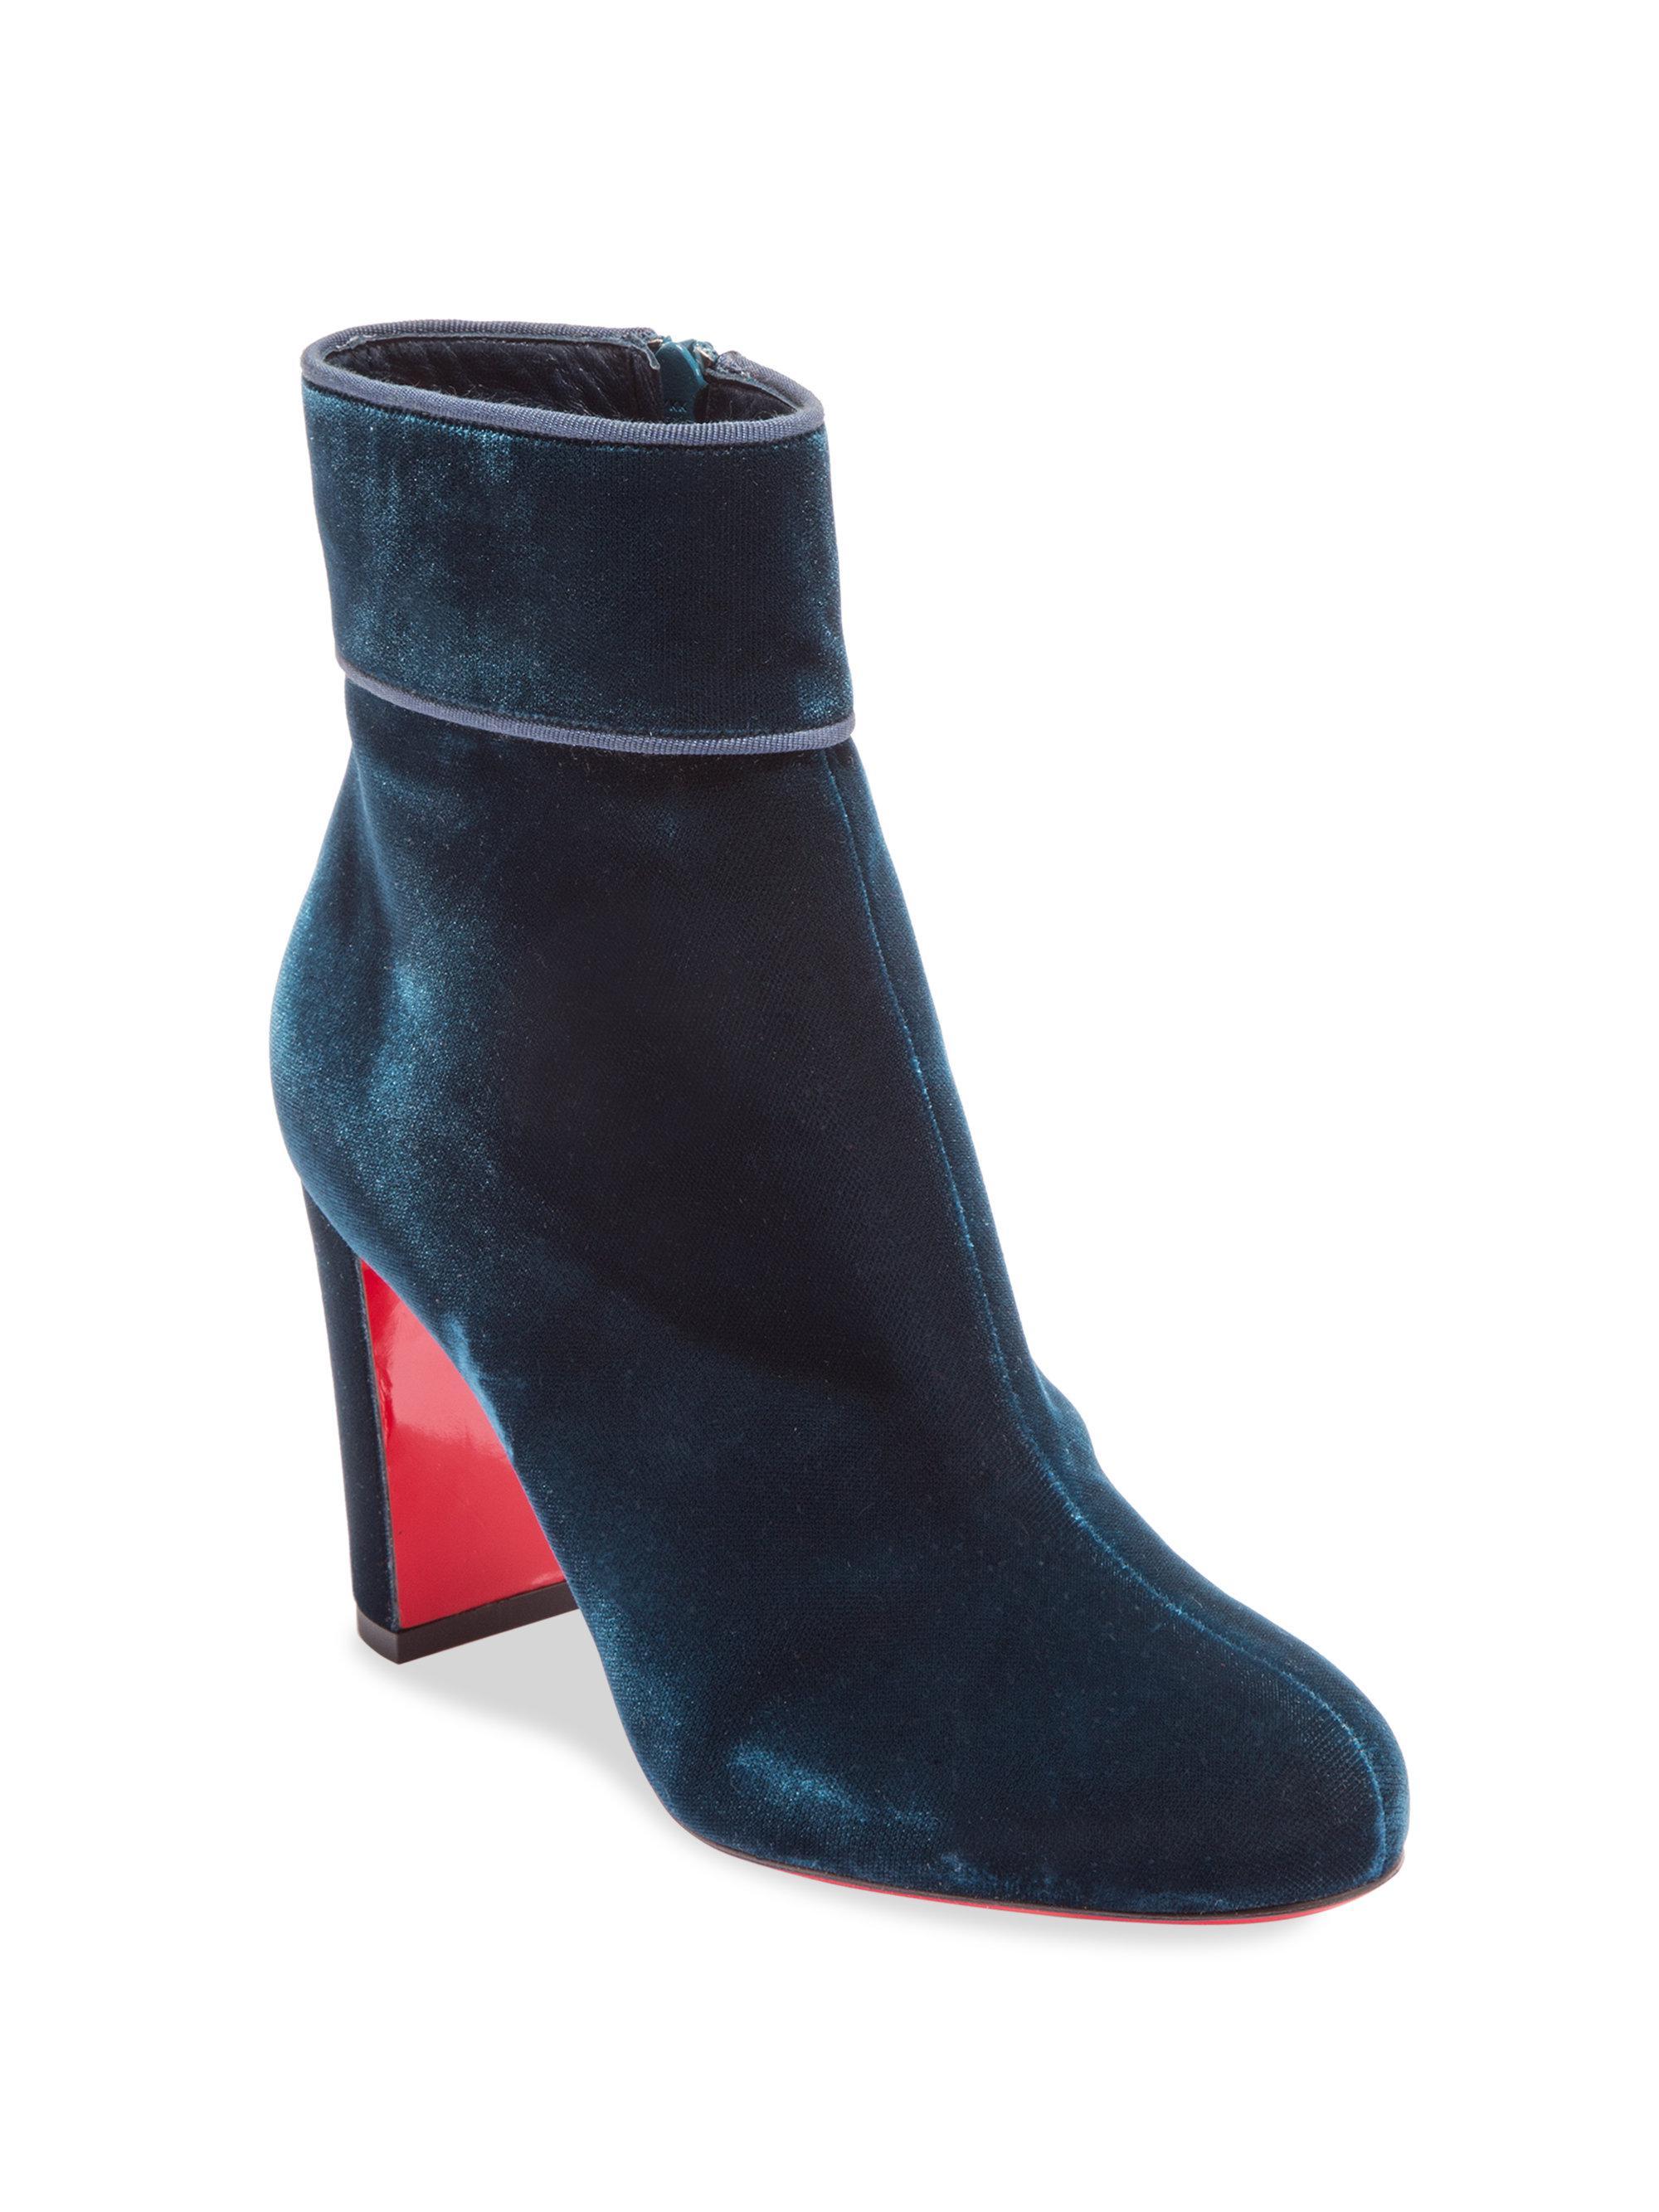 03e4a422e7a8 Lyst - Christian Louboutin Moulamax 85 Velvet Block Heel Booties in Blue